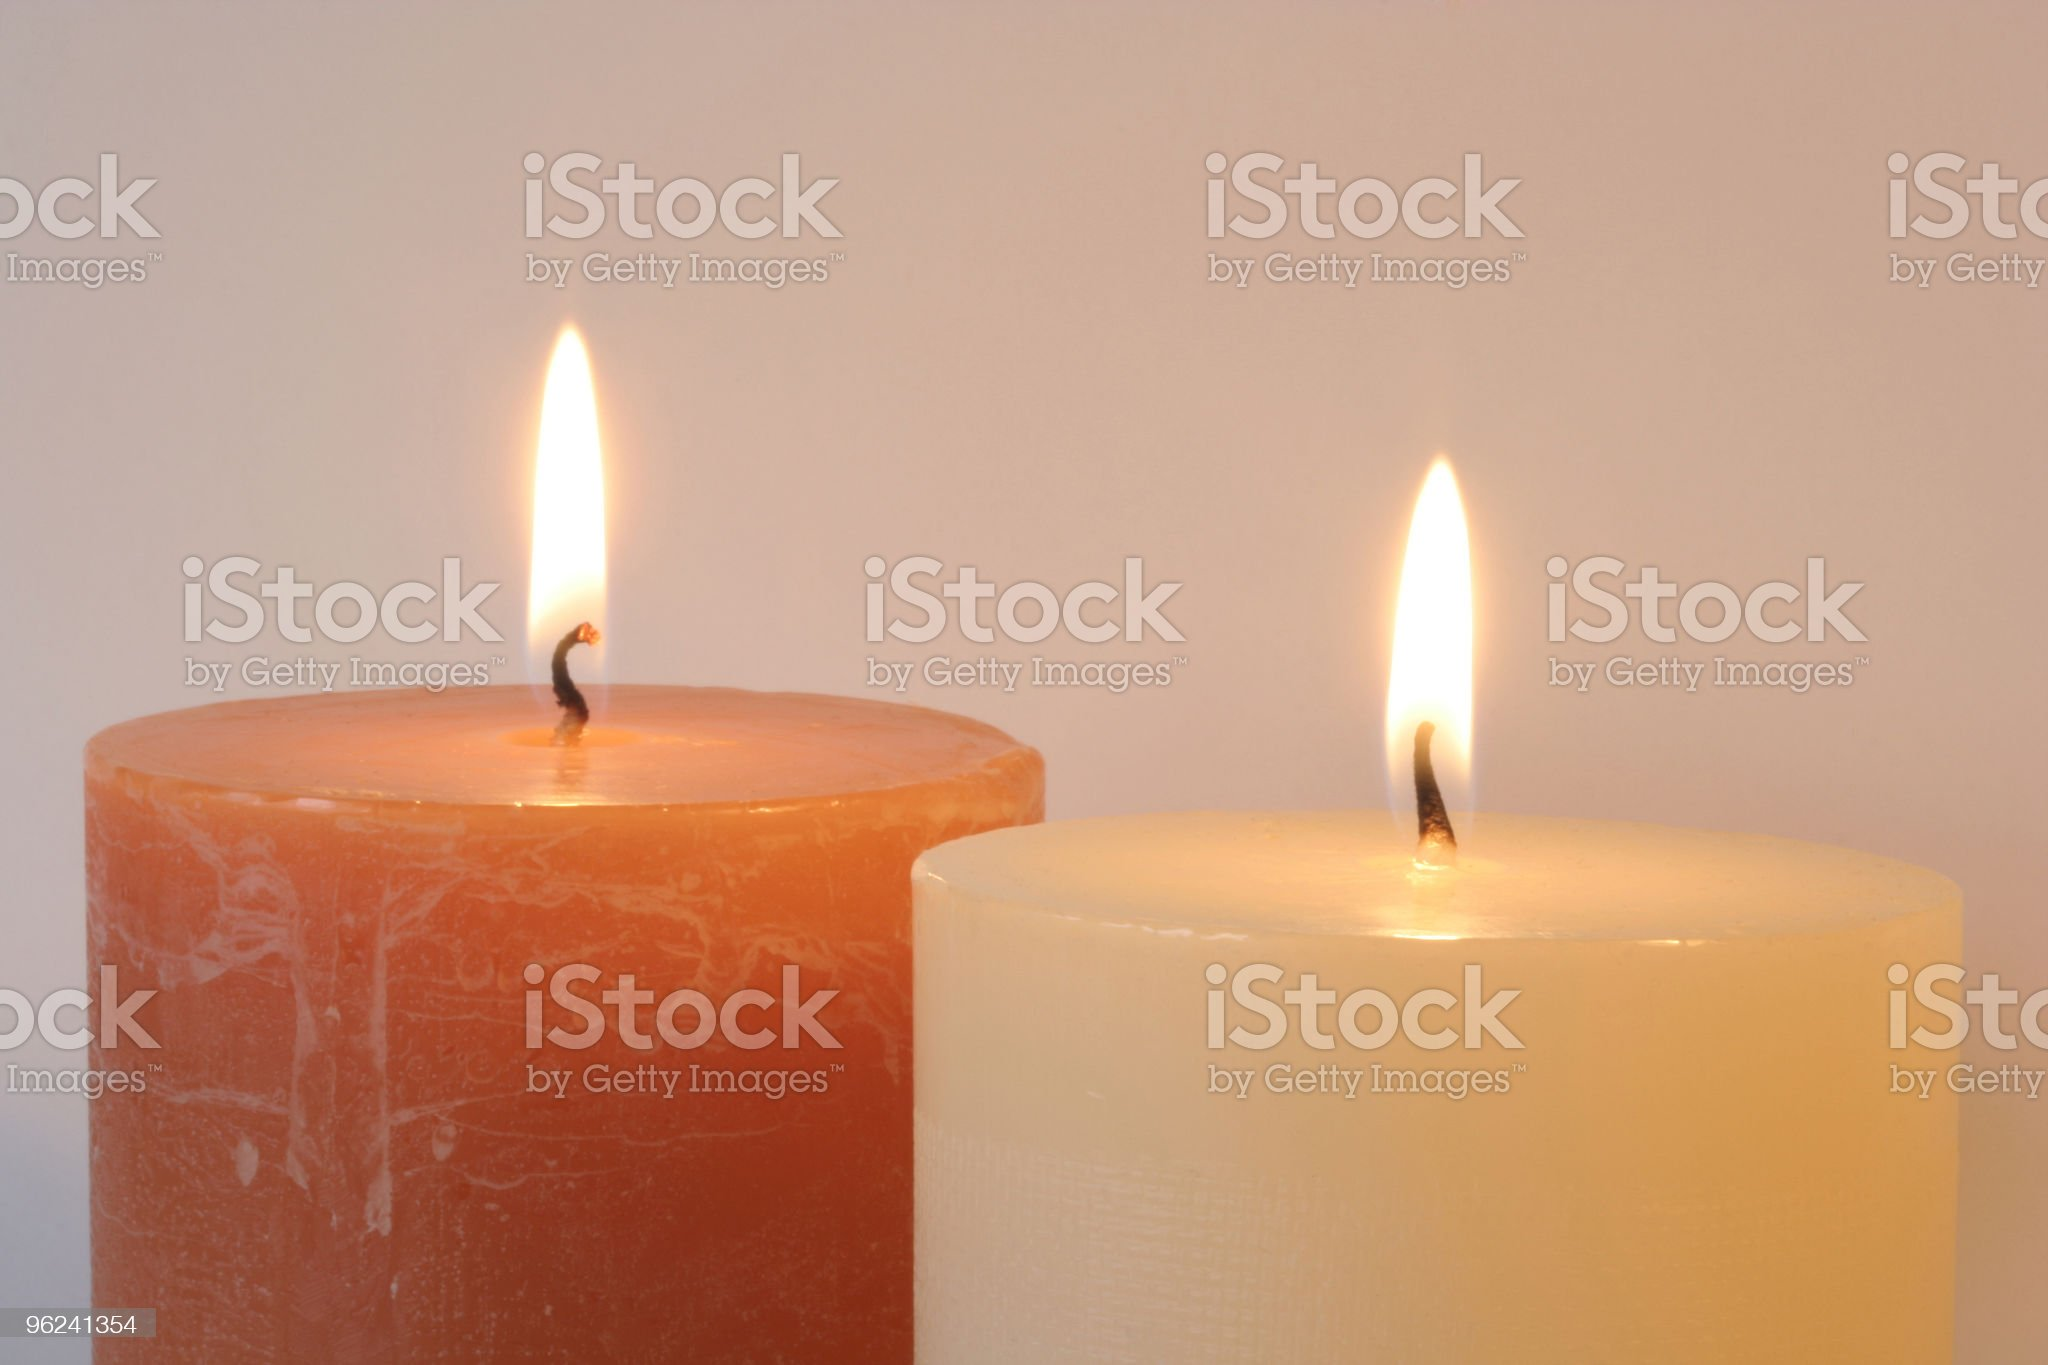 Flickering Lights royalty-free stock photo